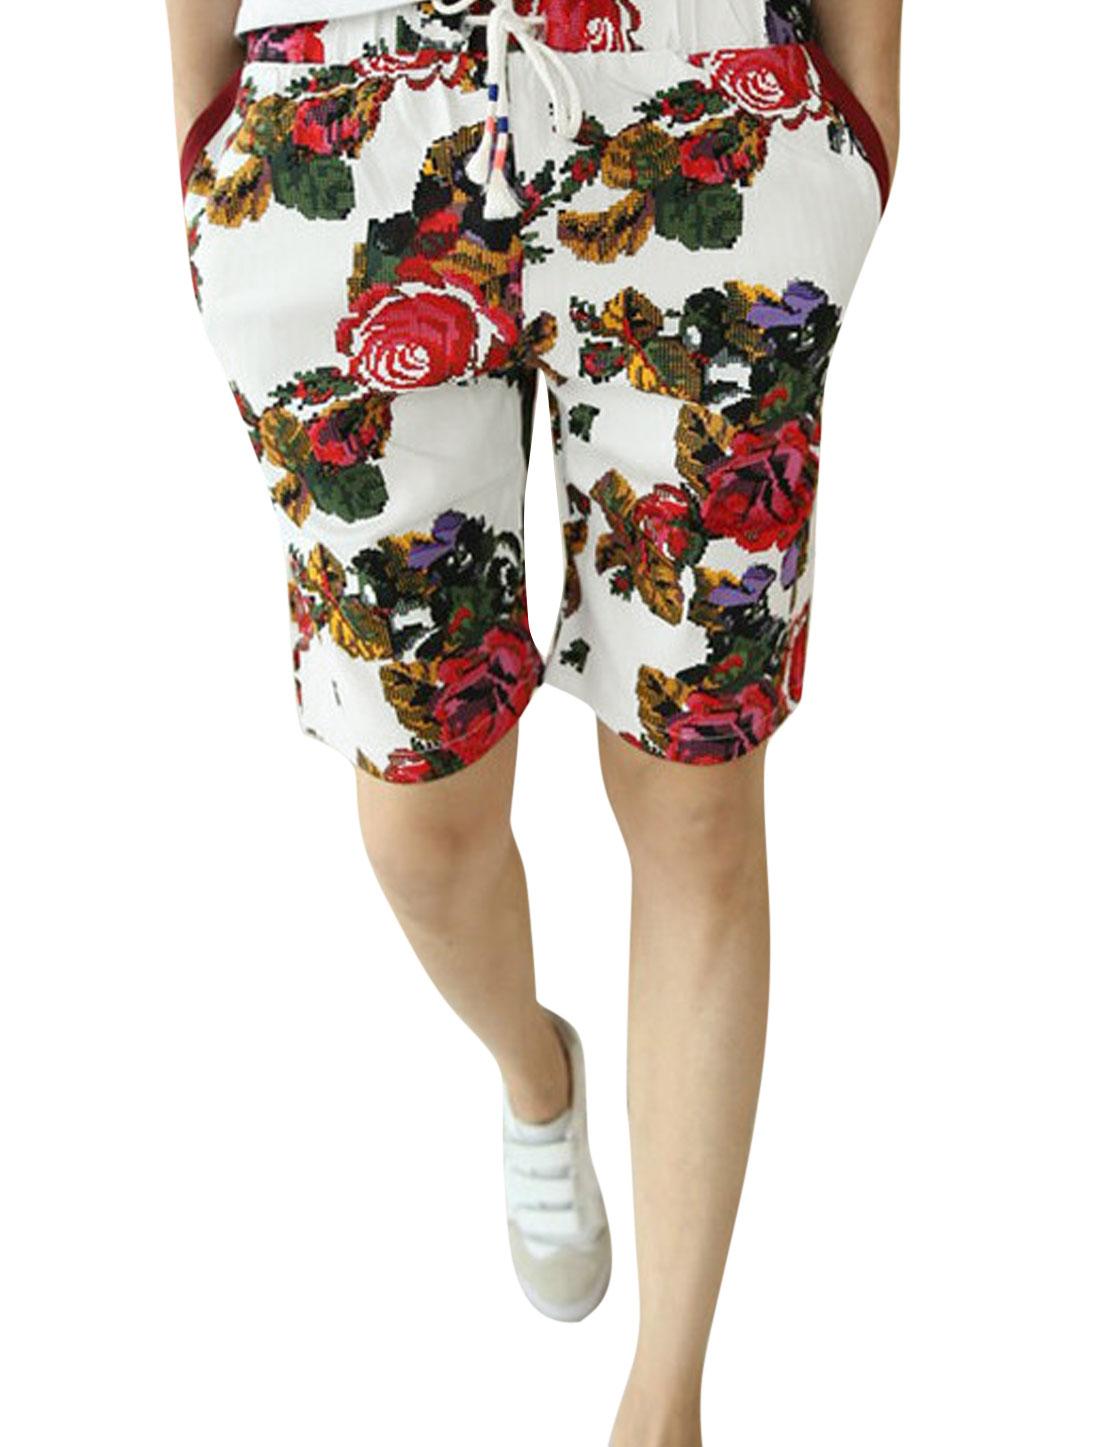 Man Double Slant Pocket Sides Flower Pattern White Red Shorts W30